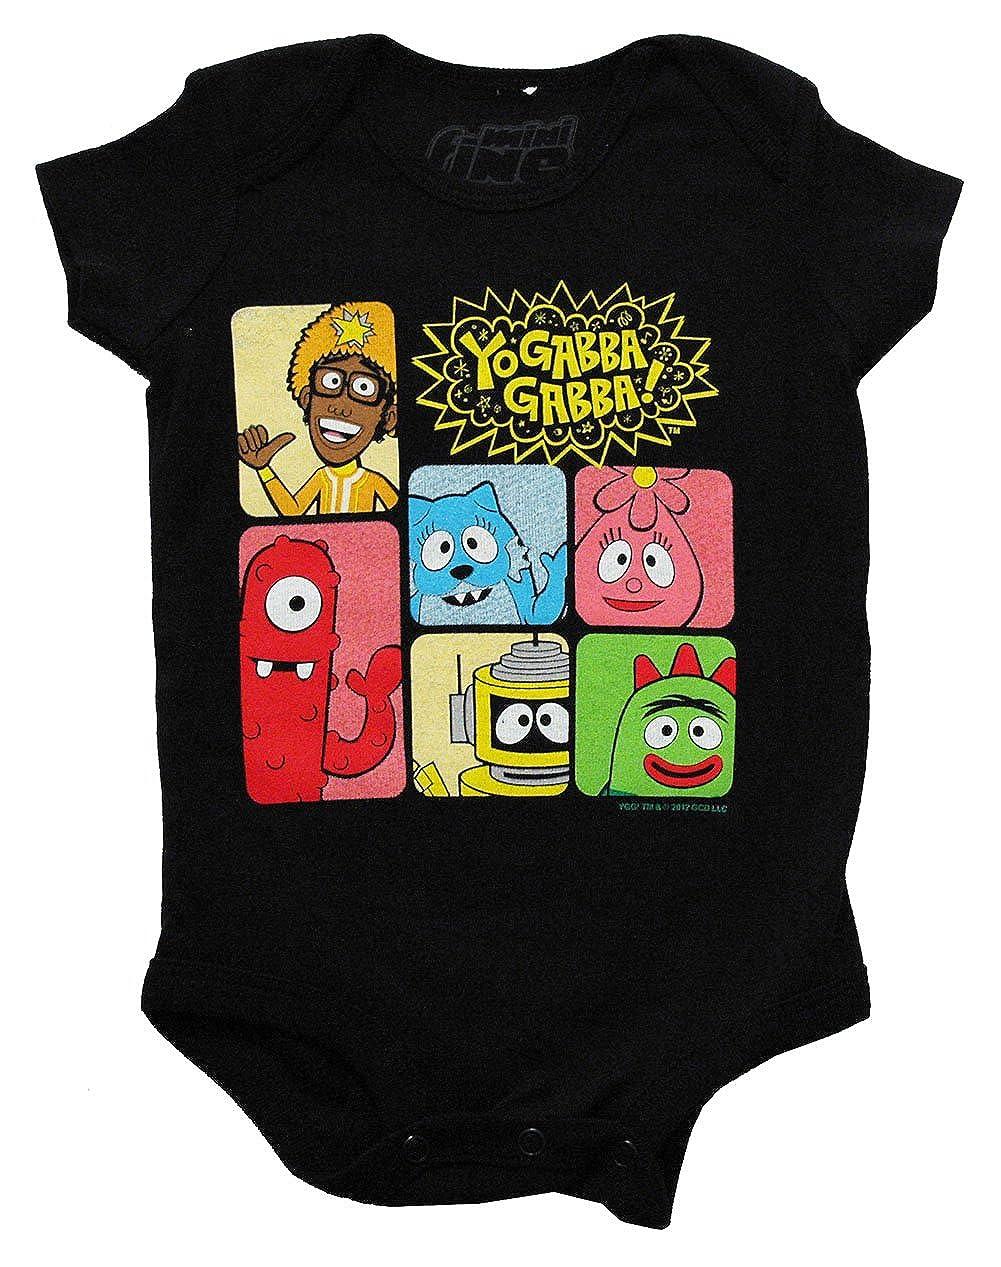 Mini Fine Yo Gabba Gabba Group Shot Cartoon Baby Creeper Romper Snapsuit Black